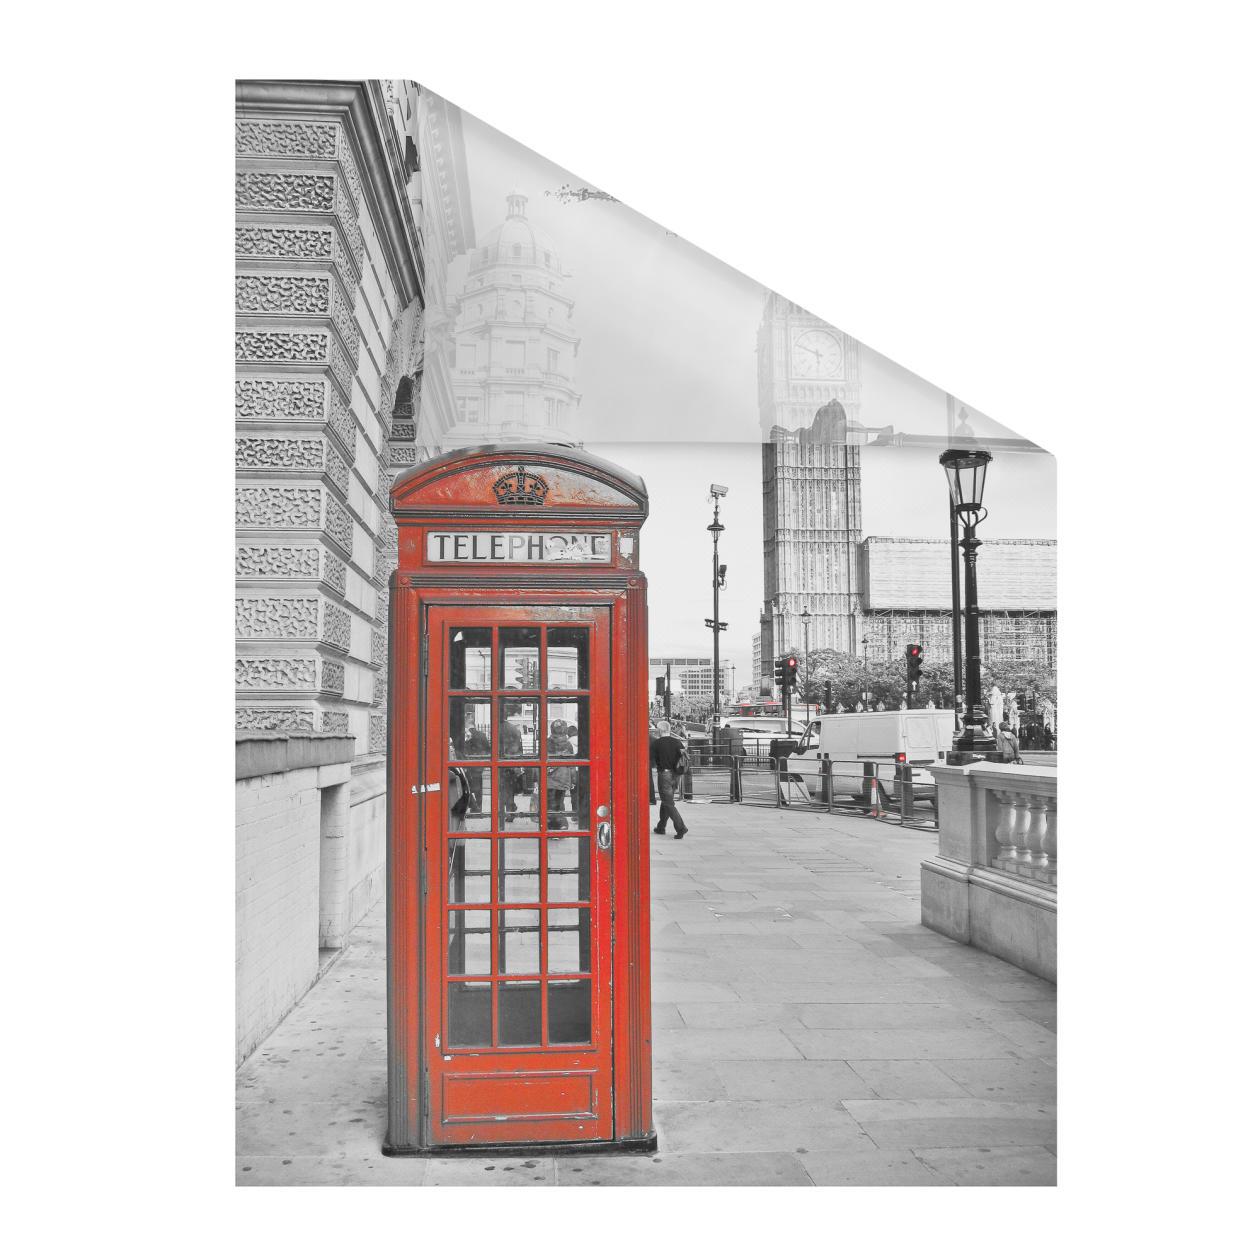 fensterfolie selbstklebend sichtschutz london rot lichblick shop. Black Bedroom Furniture Sets. Home Design Ideas